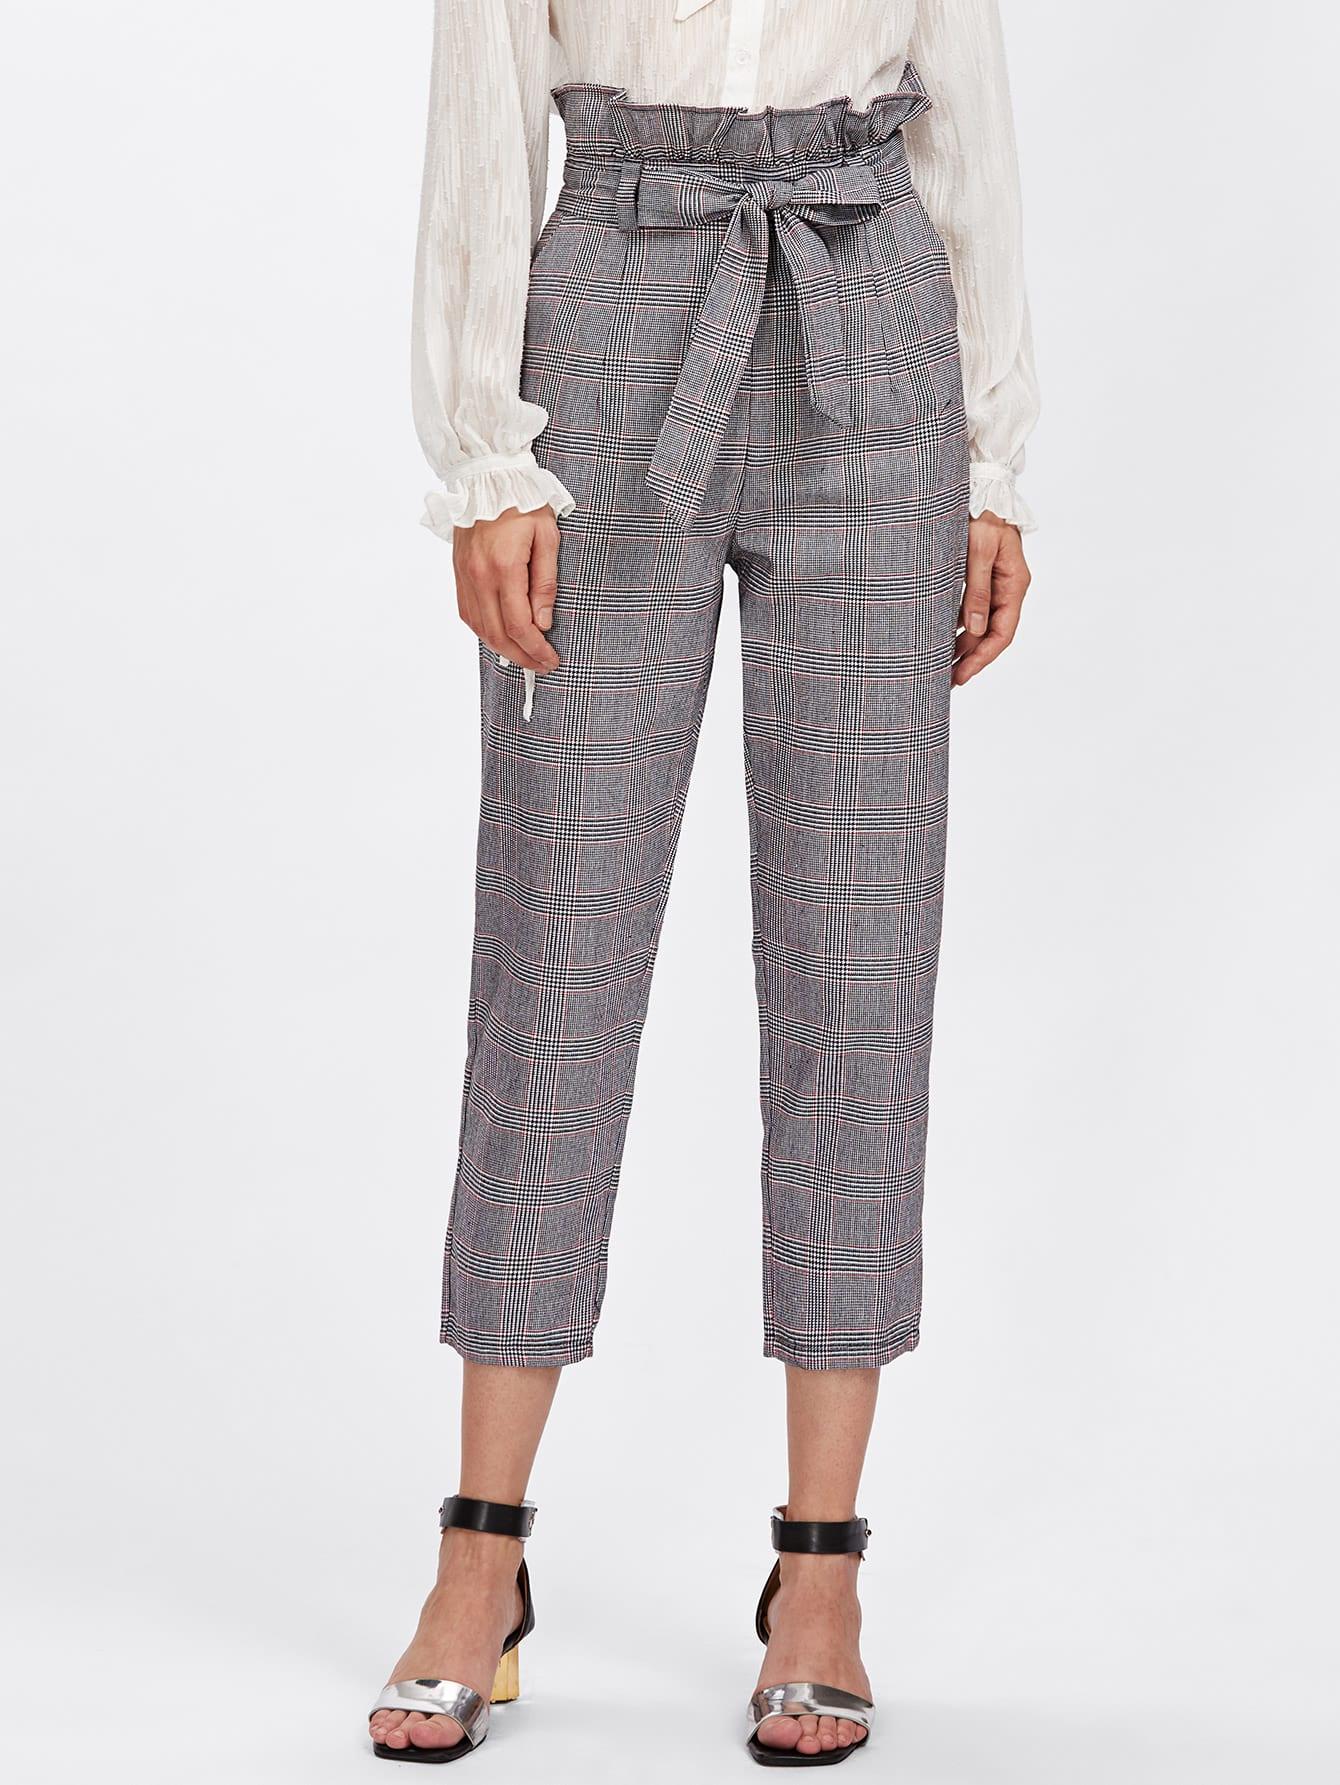 Frill Waist Self Tie Capri Pants striped ruffled waist self tie pants